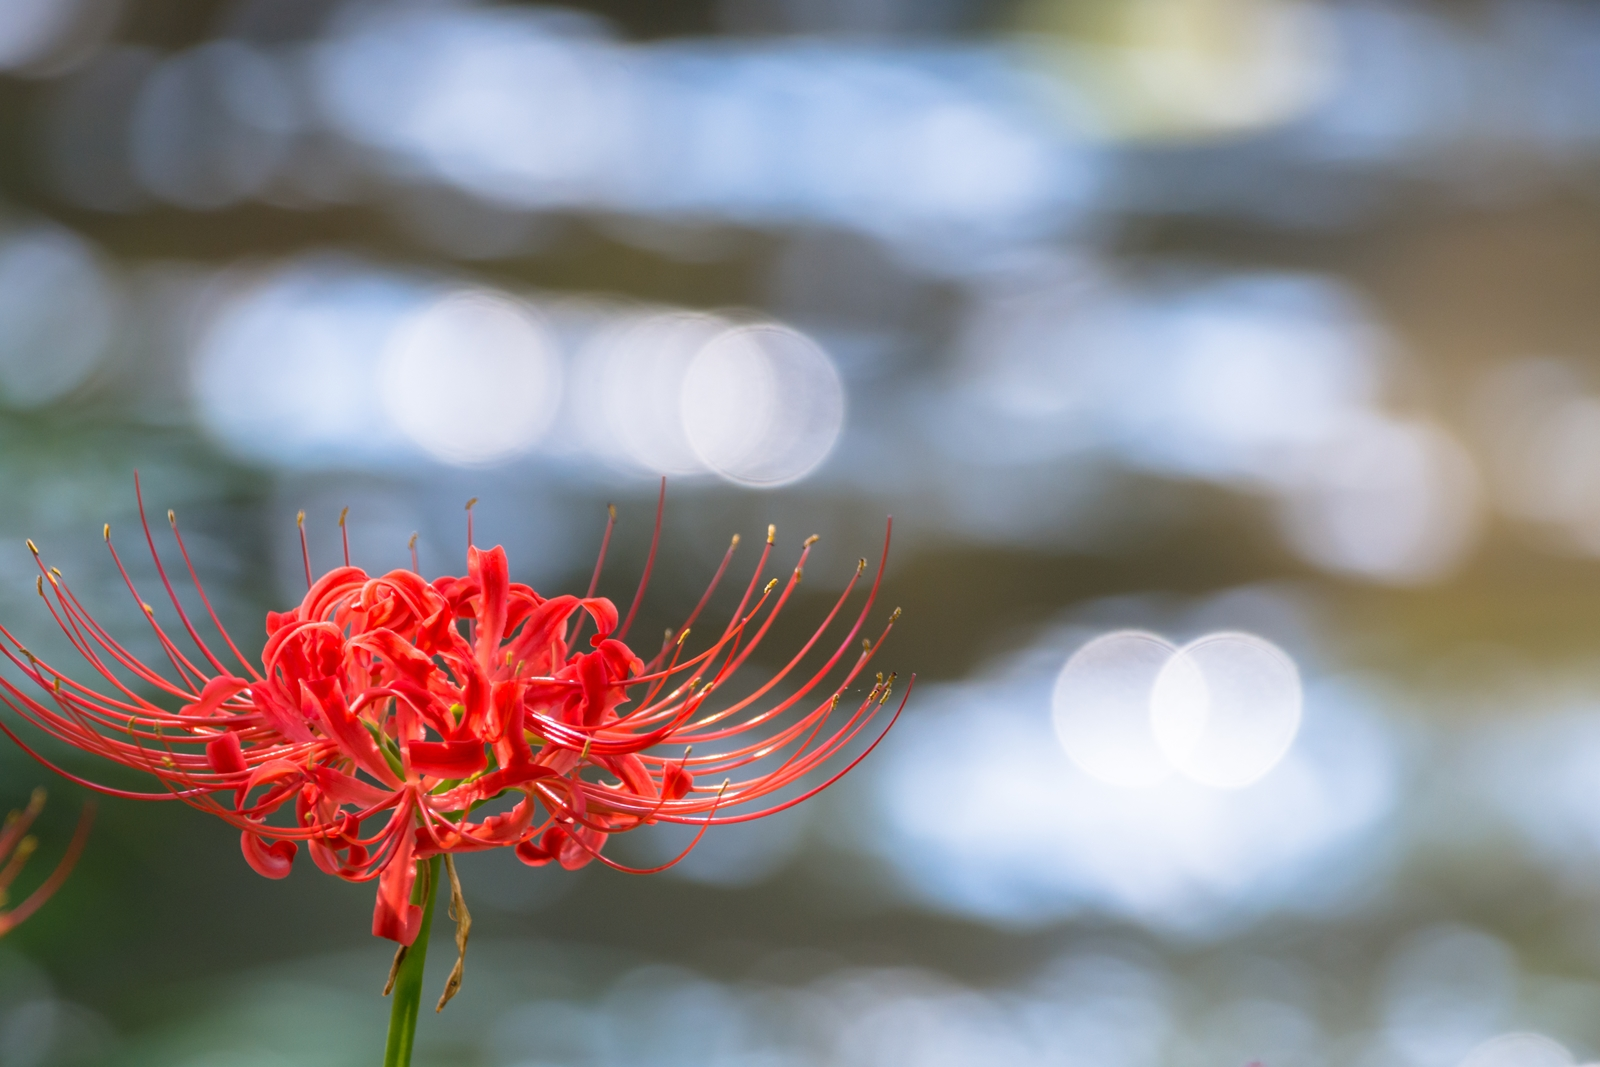 Photo: 流れをそっと見送る Watch the flow of time.  きらりきらり輝き そして流れていく 今年も気付くとそこに佇み そっと光を見送っている  Photo of red spider lily. (二ヶ領の彼岸花)  #flower #nature #cooljapan #nikon #sigma  Nikon D7200 SIGMA 150-600mm F5-6.3 DG OS HSM Contemporary